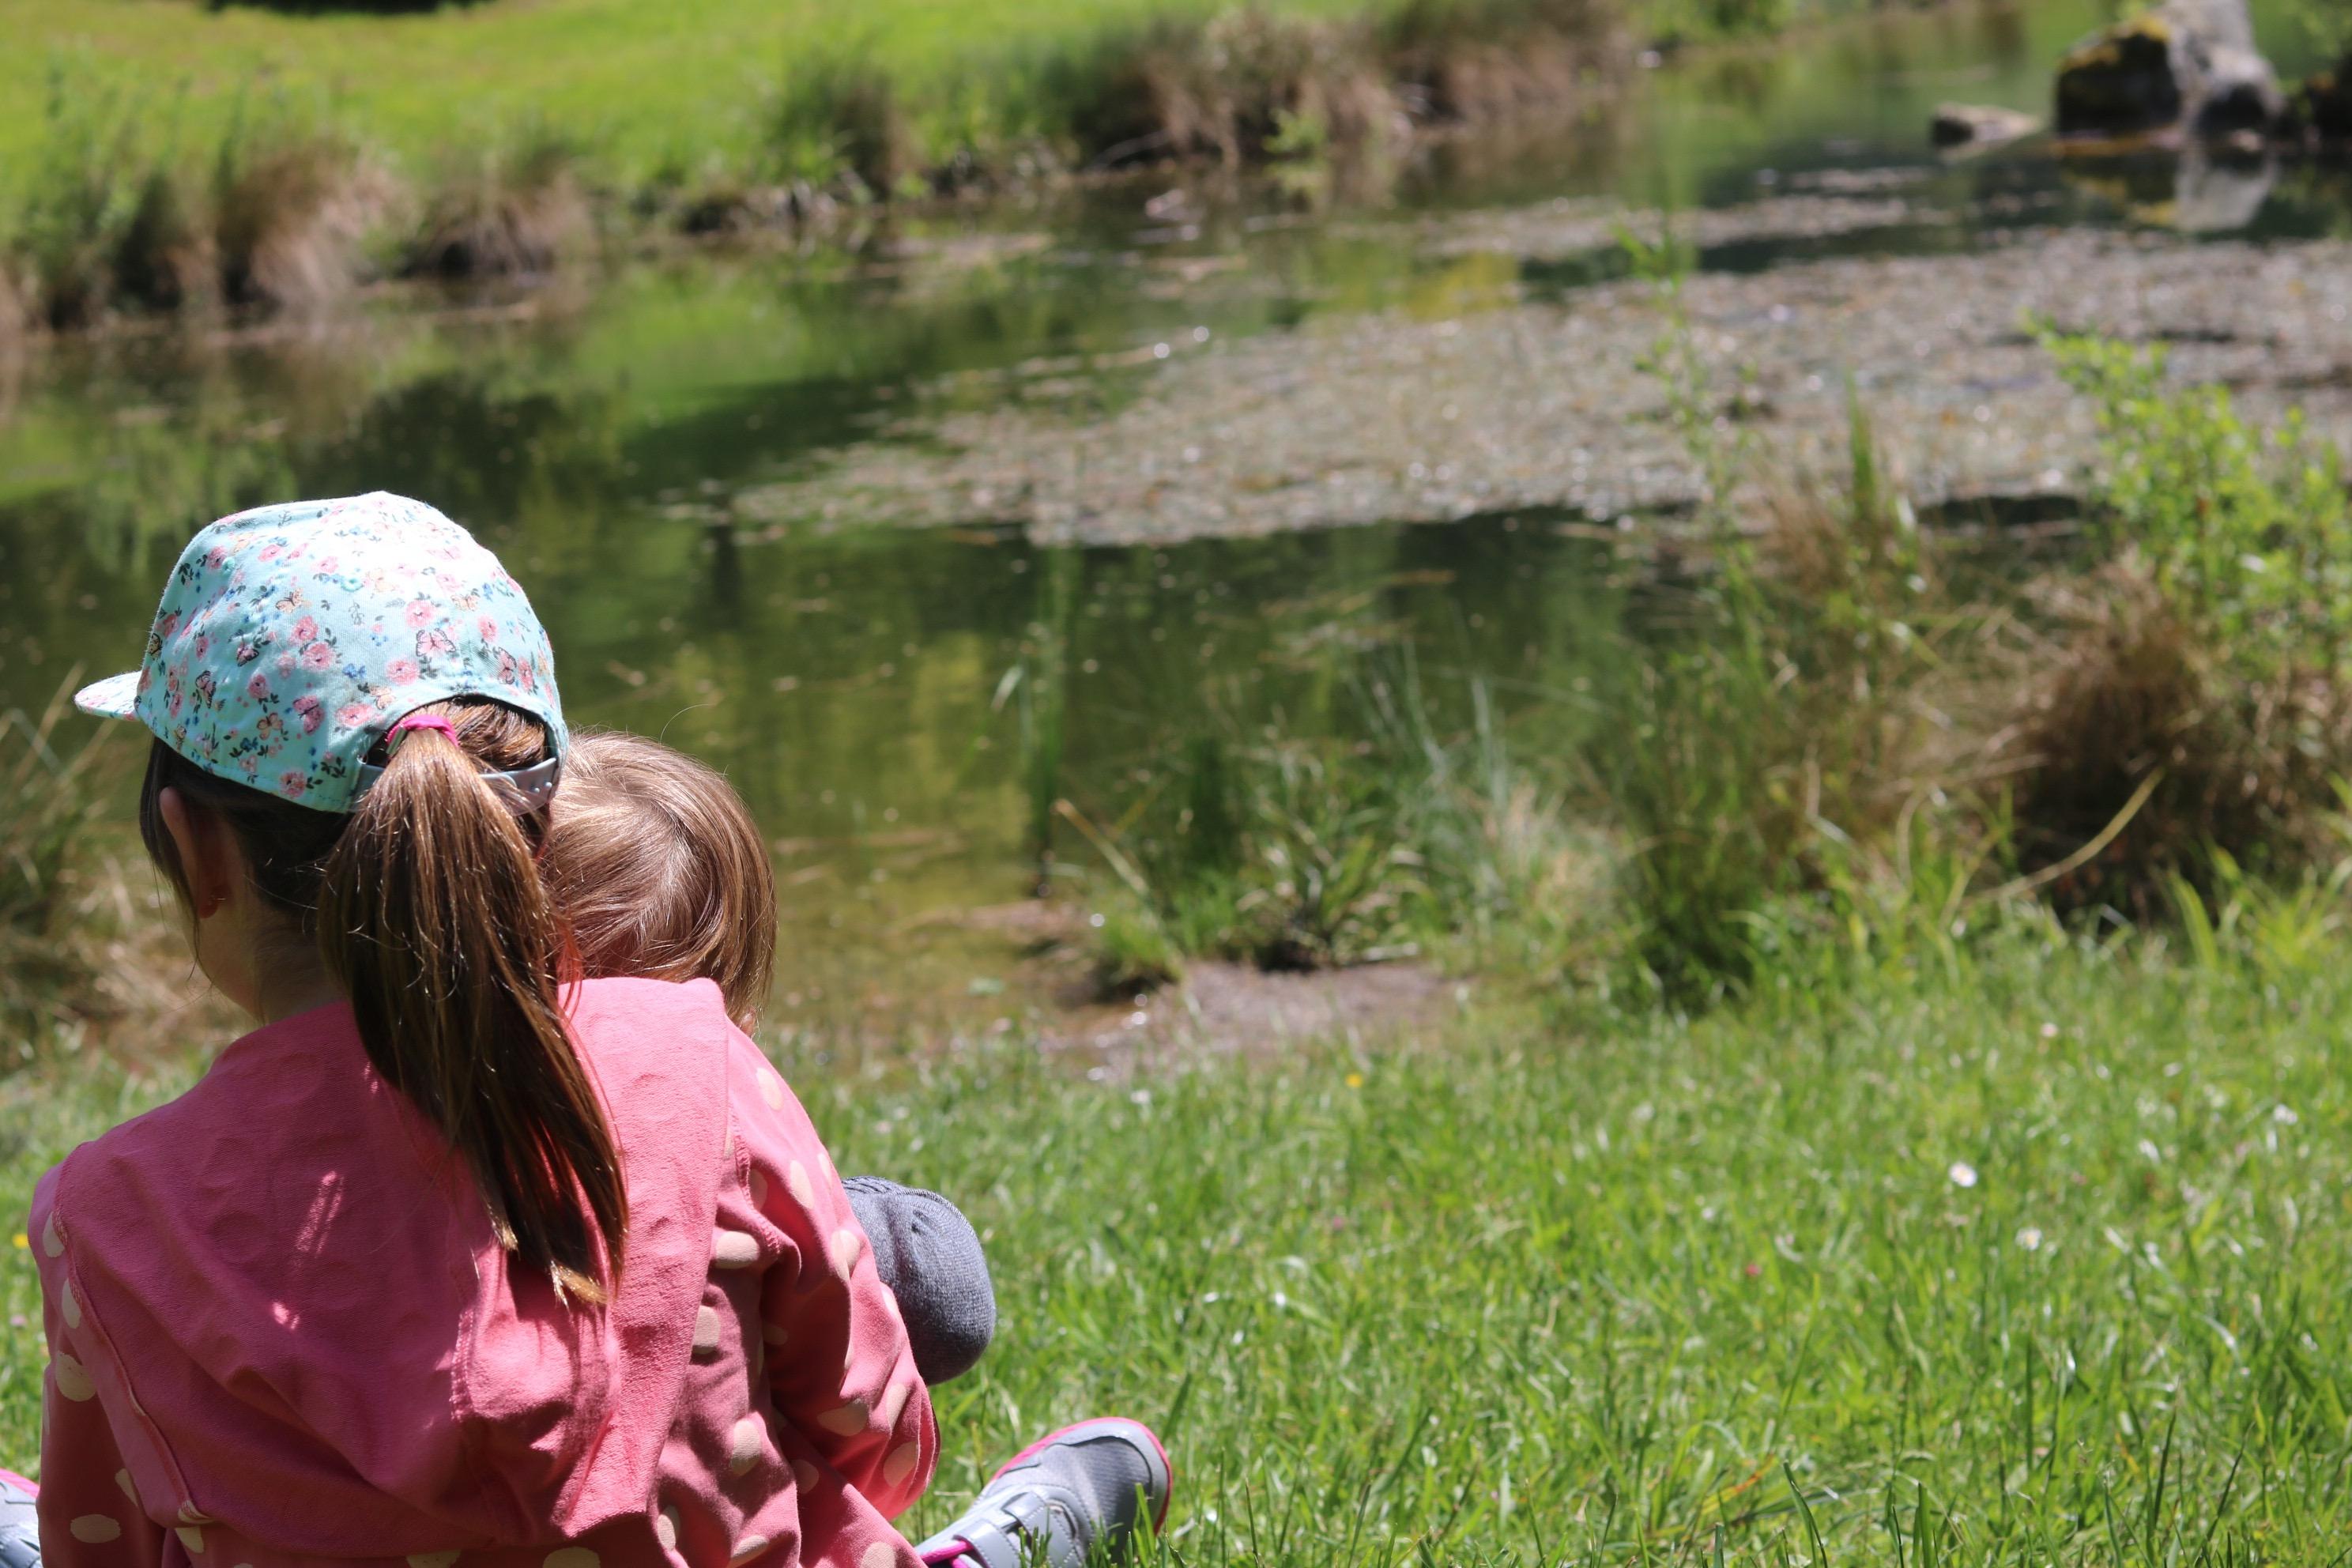 arboretum petits bonheurs blog famille vlog video youtube thereseandthekids